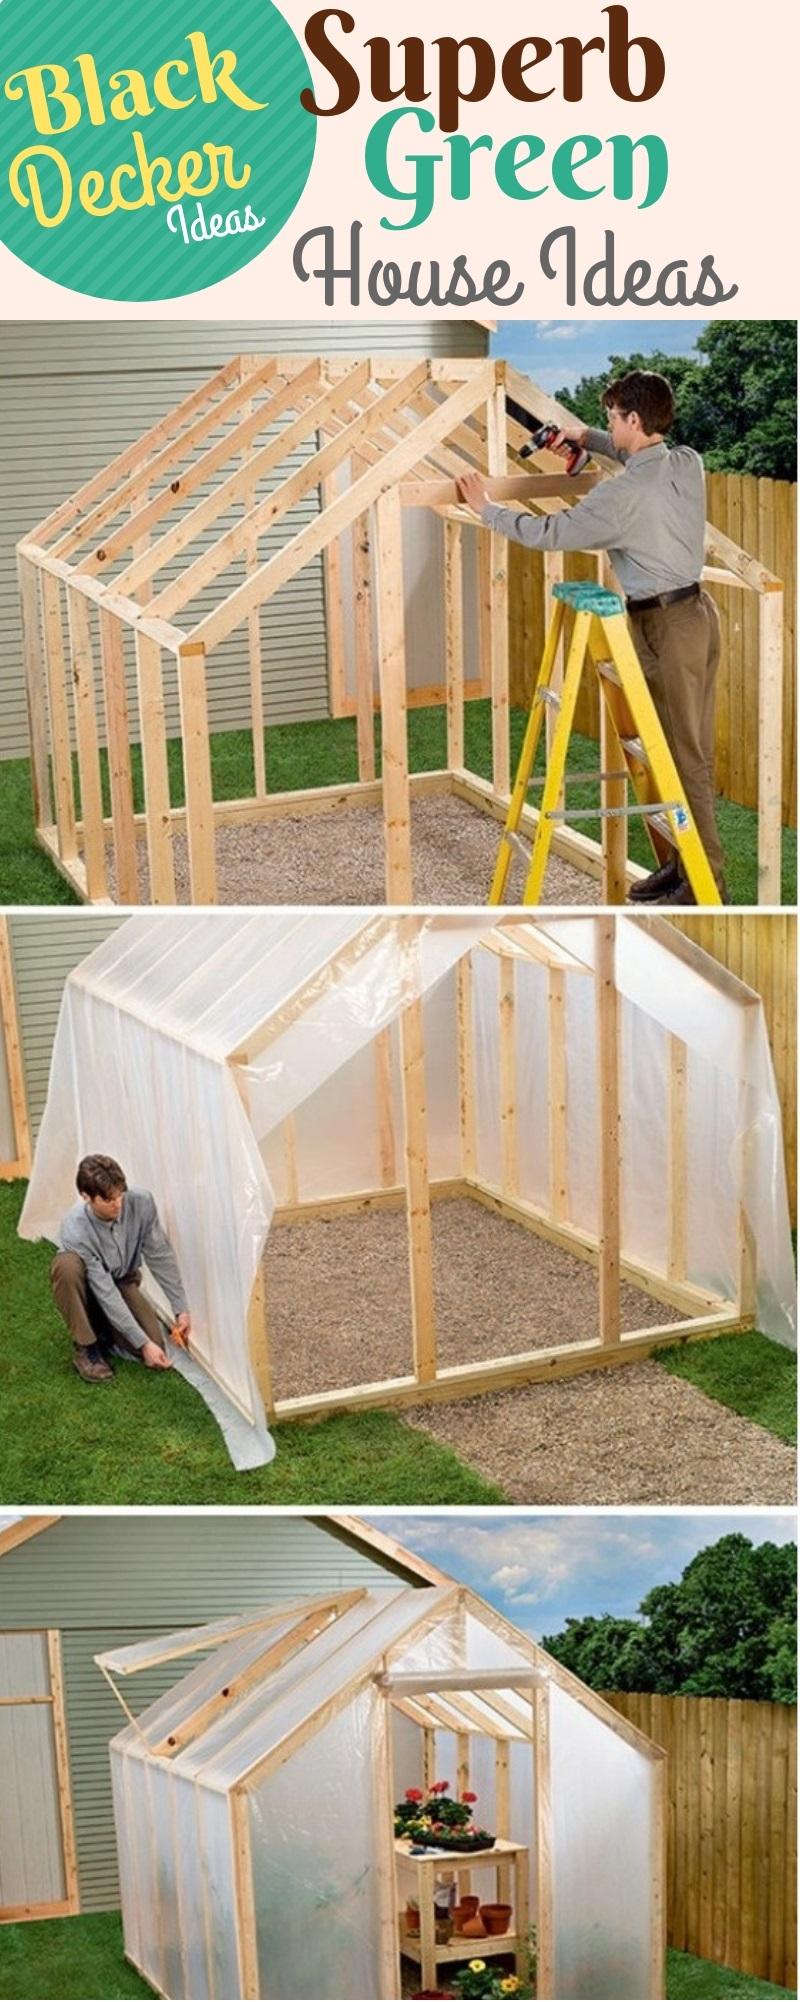 Spacious and Vivacious Green House Ideas: DIY Green House Plans